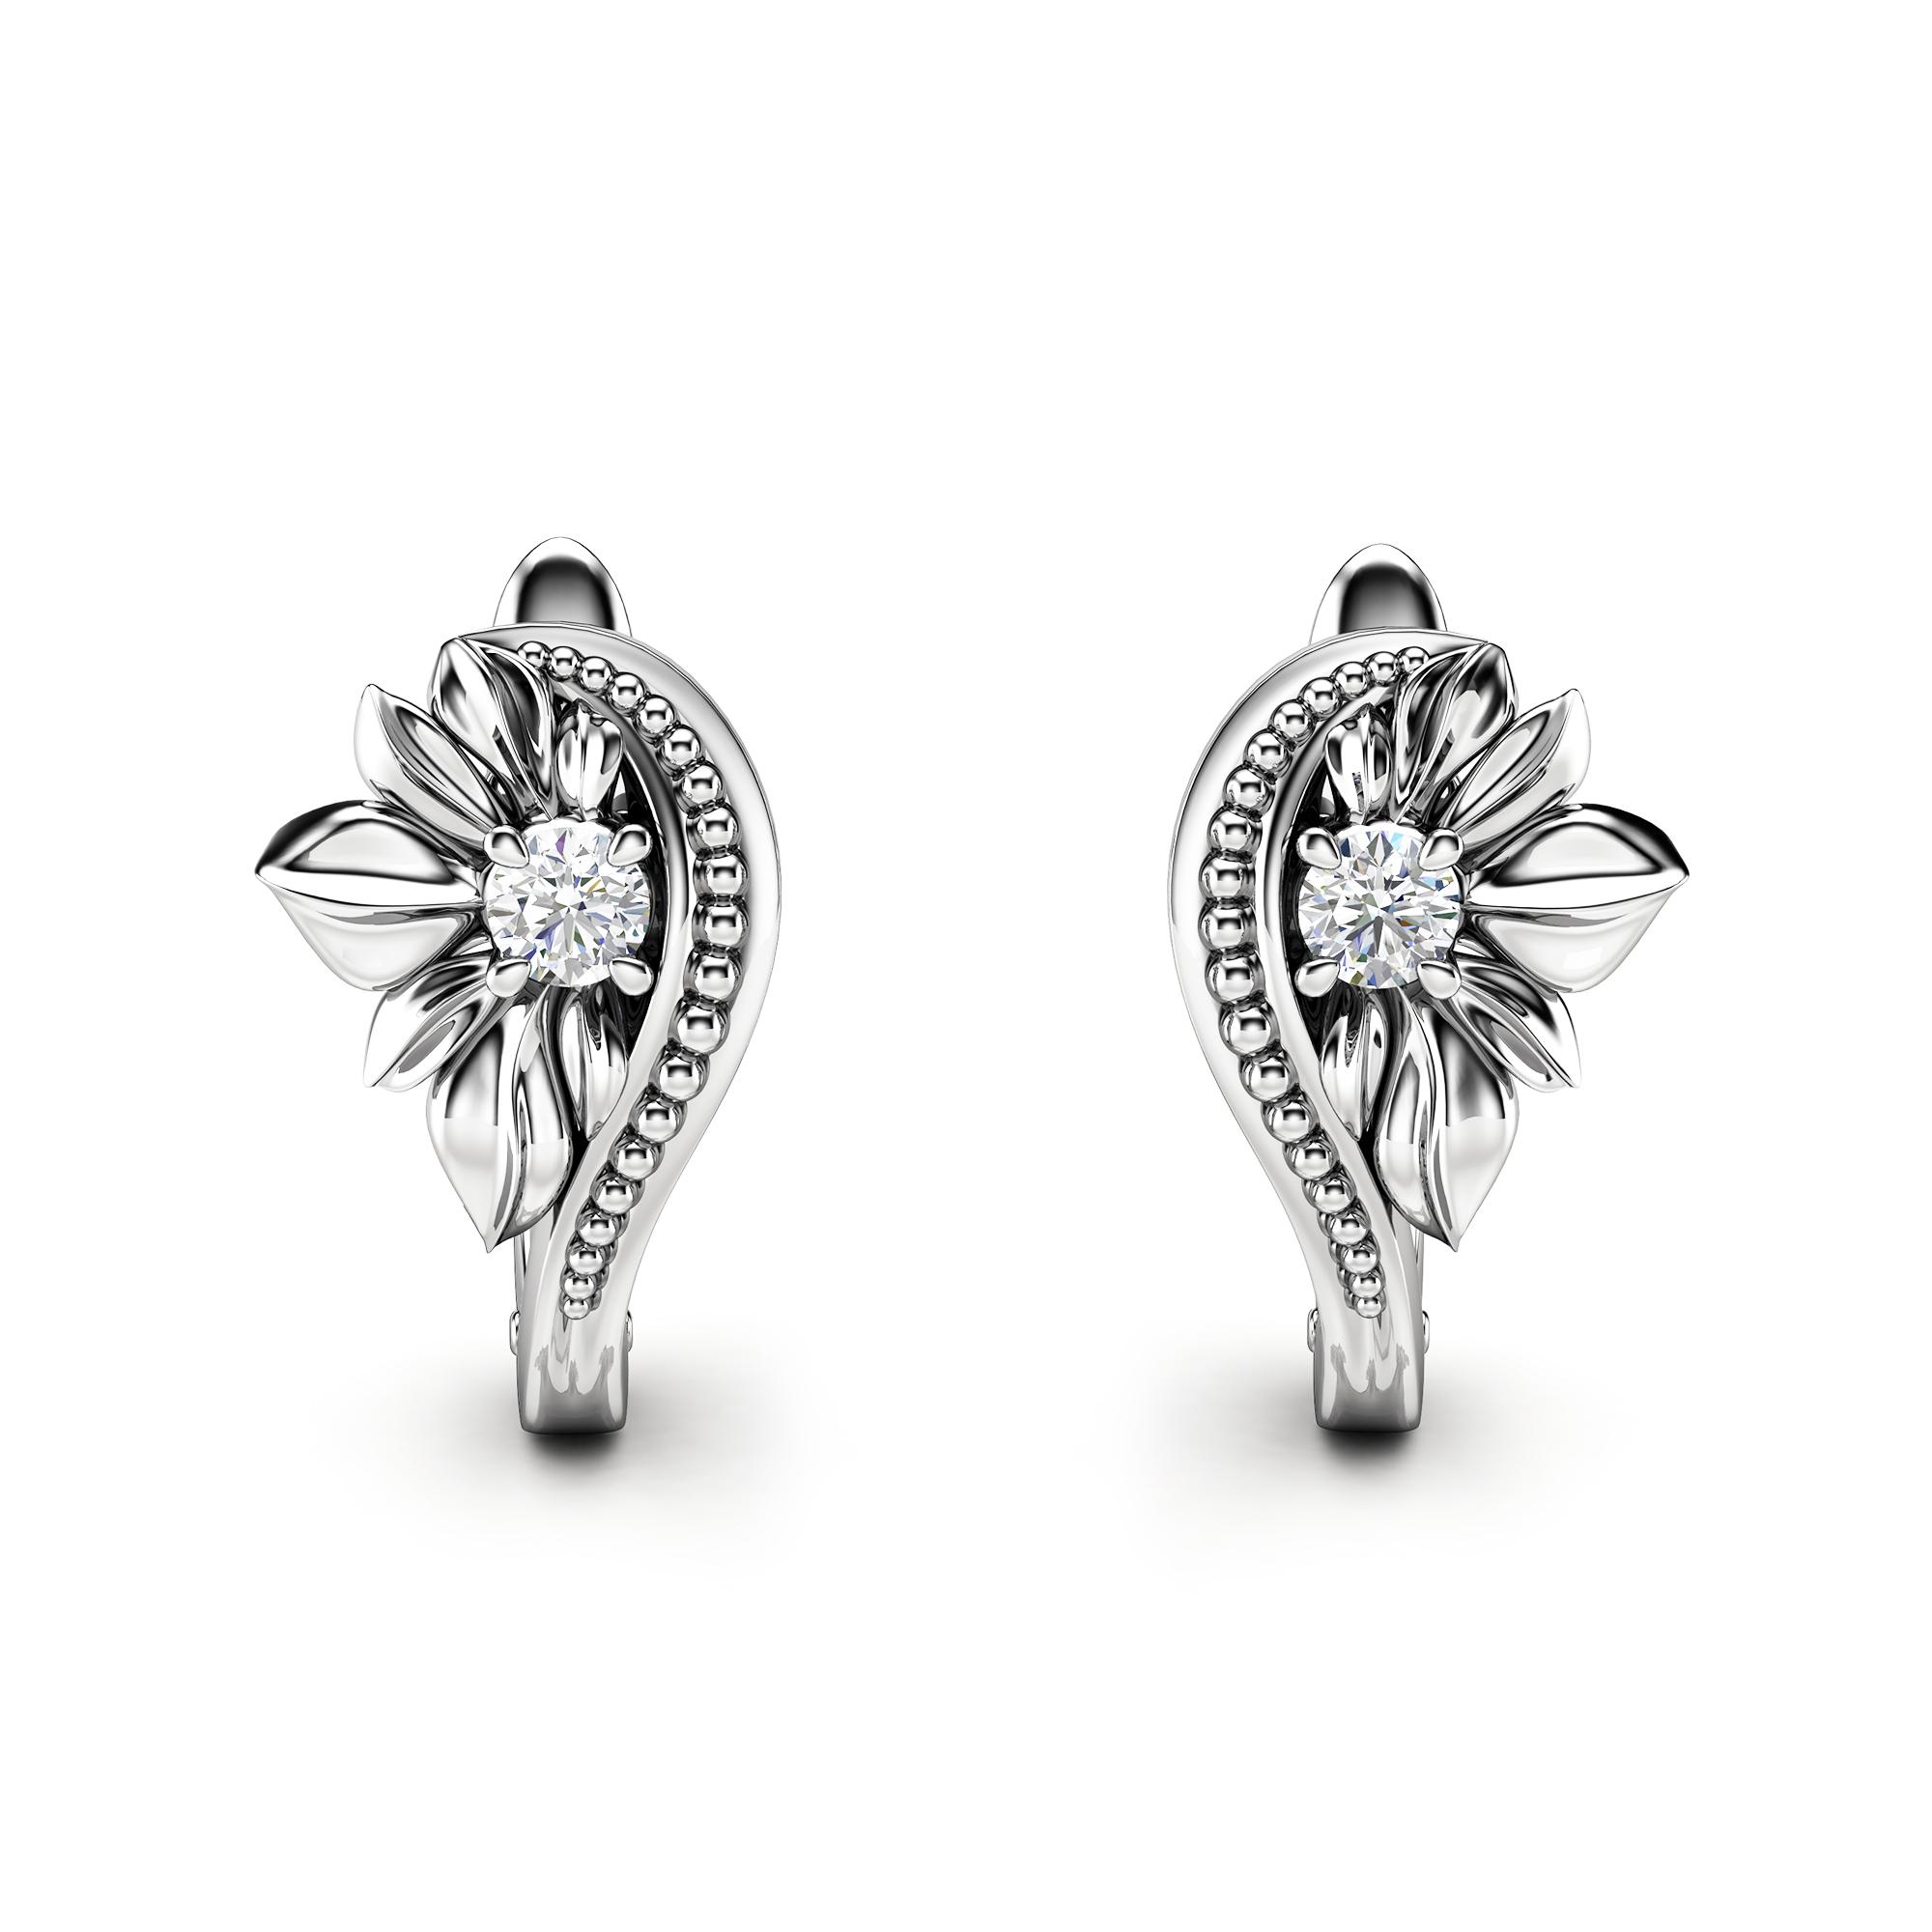 Floral Diamond Earrings Milgrain Stud Earrings White Gold Earrings Unique Flower Diamond Earrings